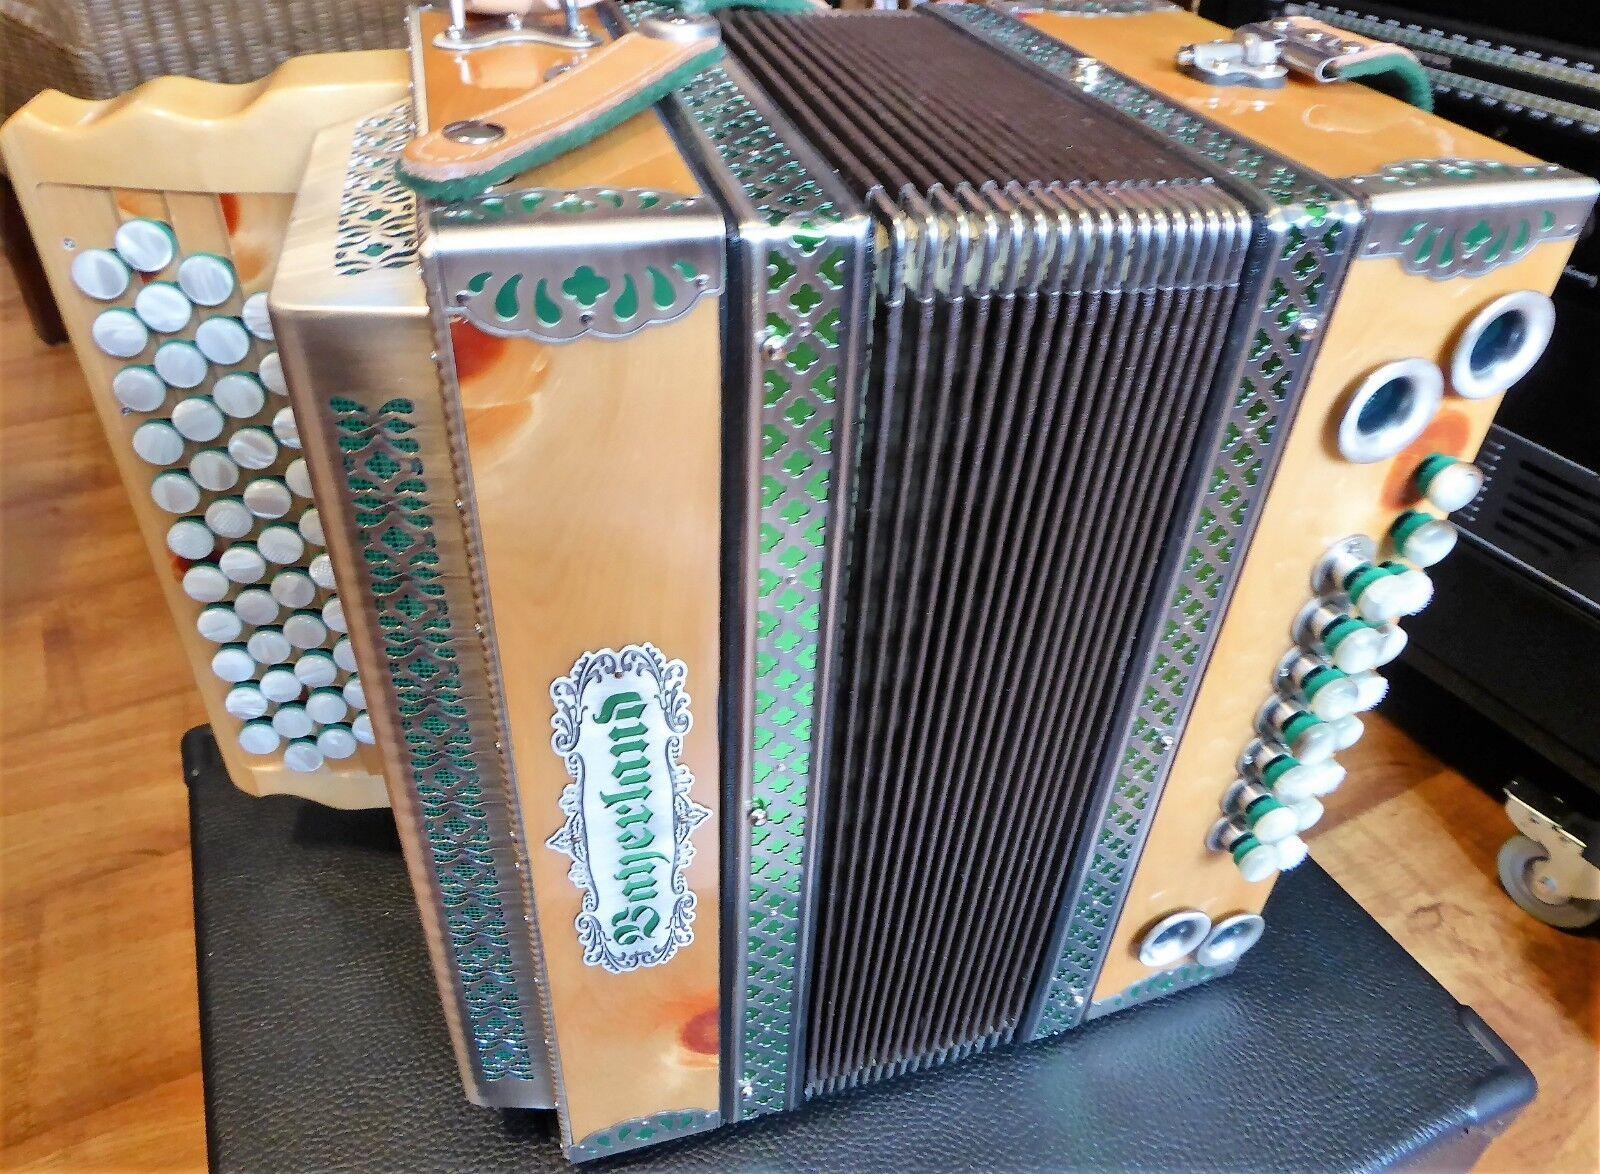 steirische harmonika bayerland holz hochglanz 4 reihig - g,c,f,b - fast neu